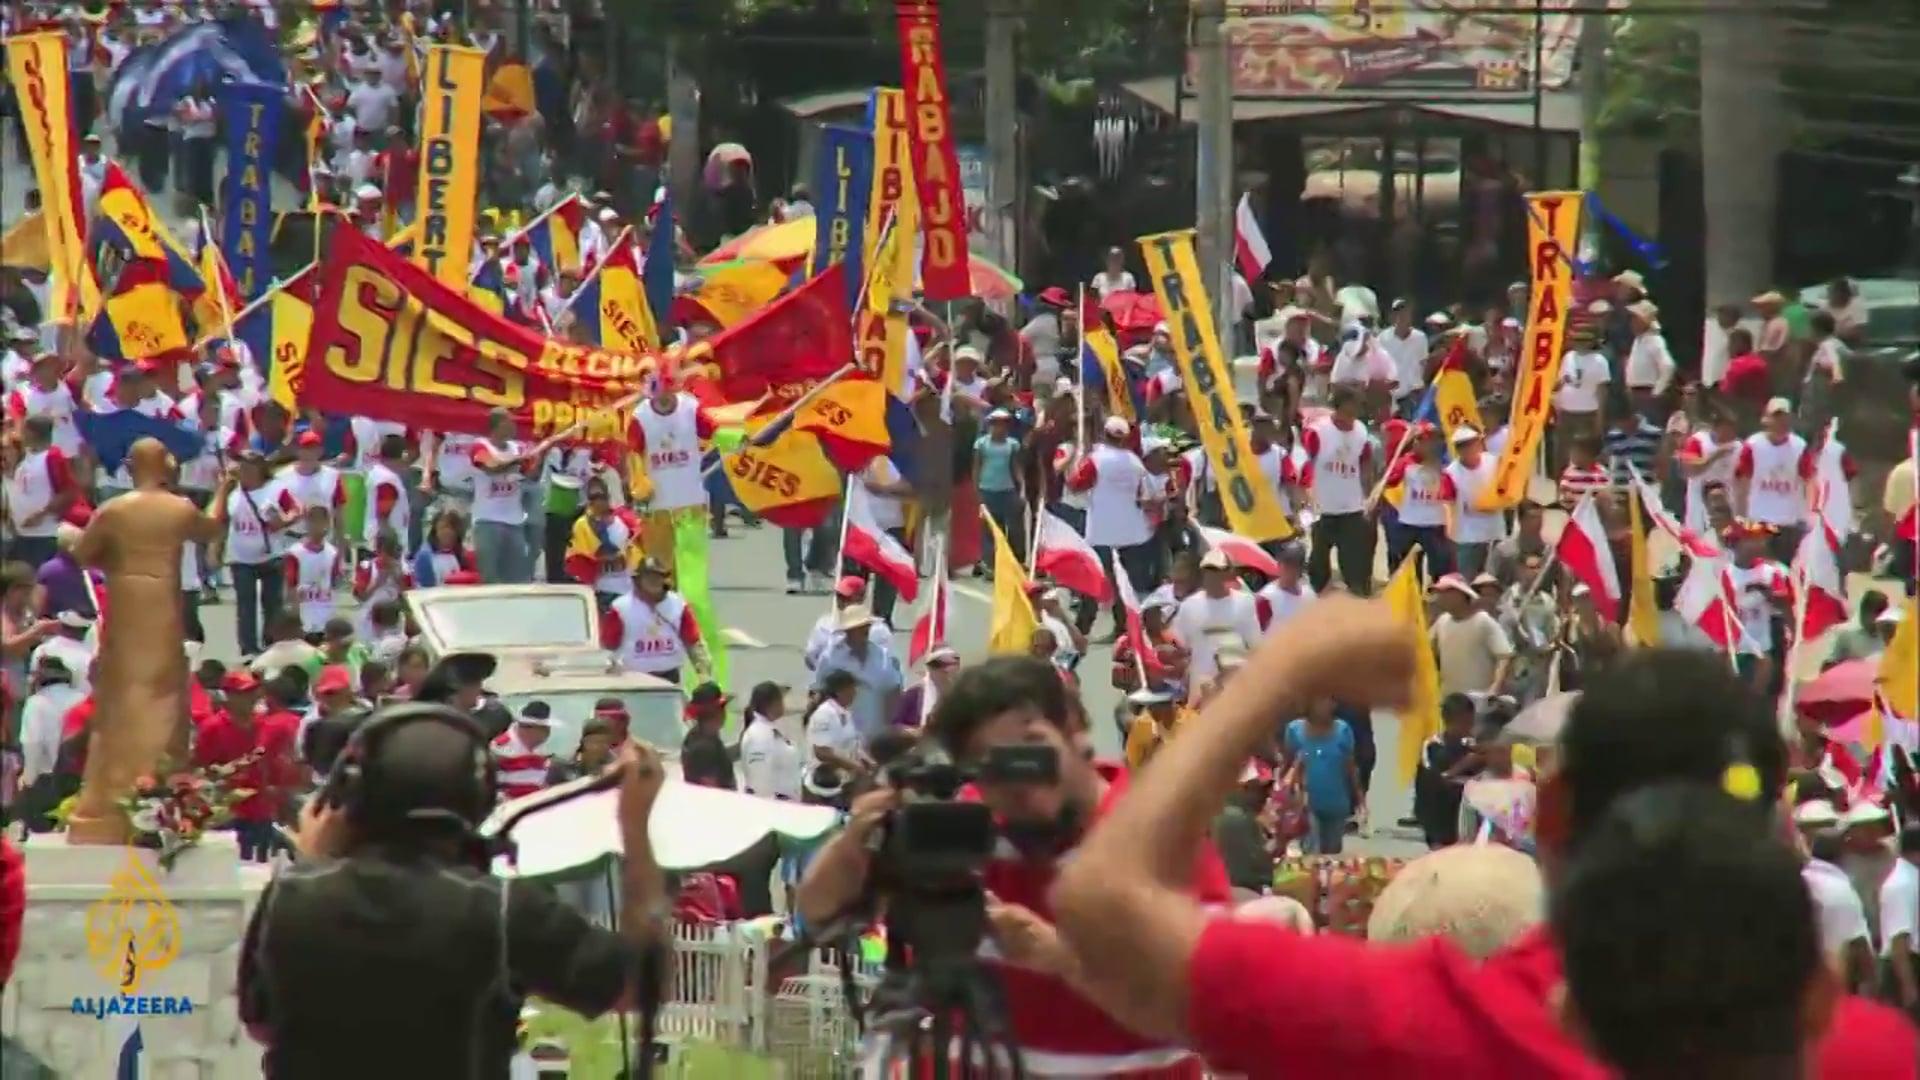 Al Jazeera documentary: El Salvador - Life at Any Price